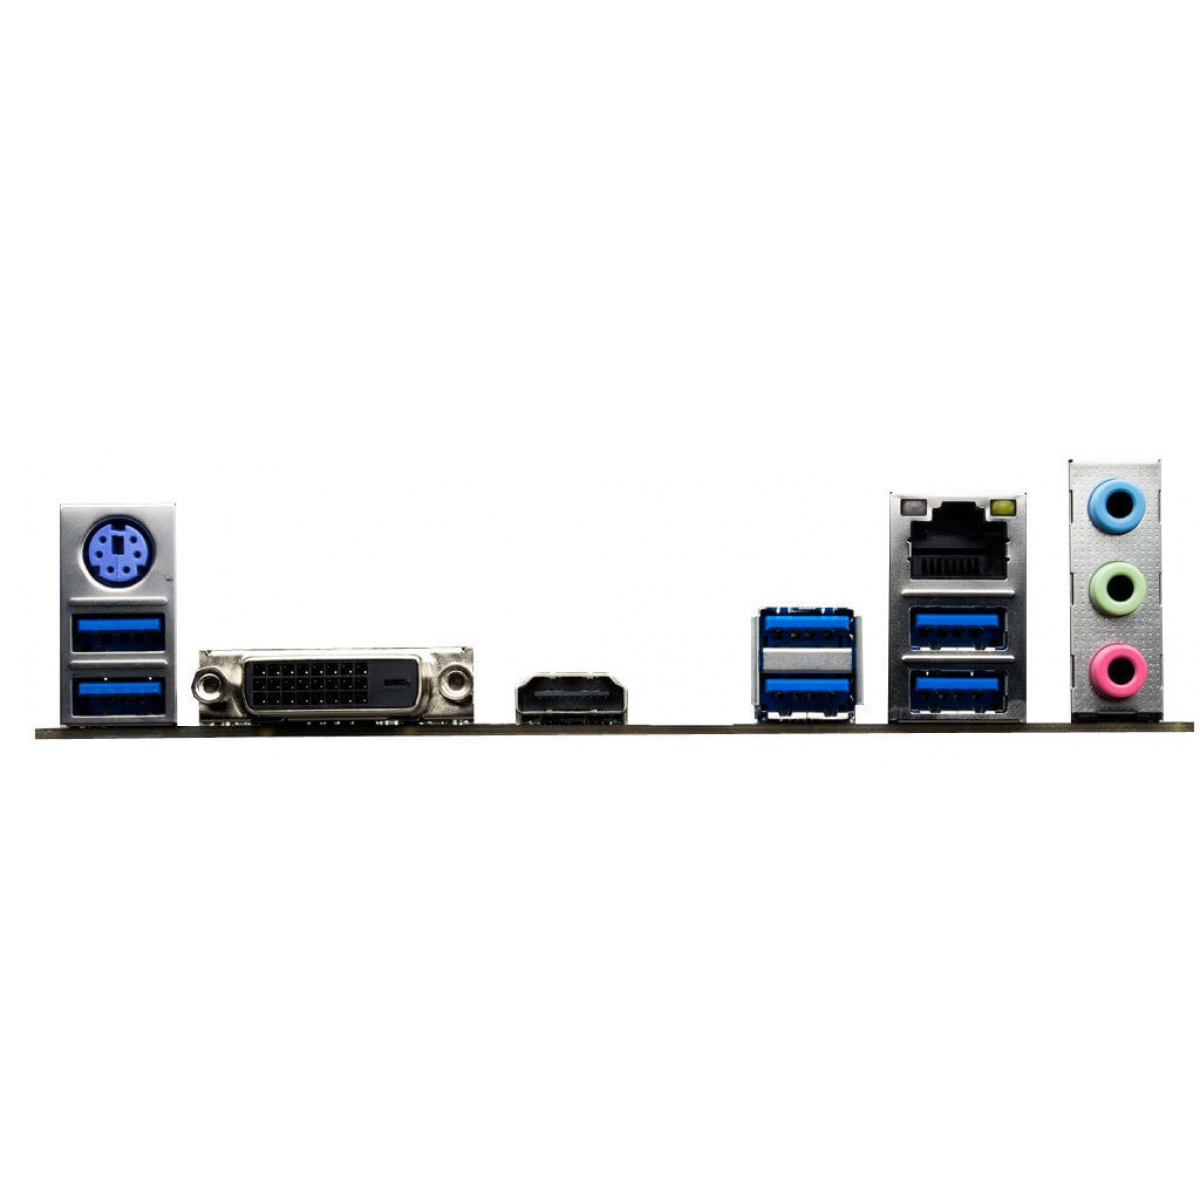 Placa Mãe Biostar Racing B350GT3, Chipset B350, AMD AM4, mATX, DDR4